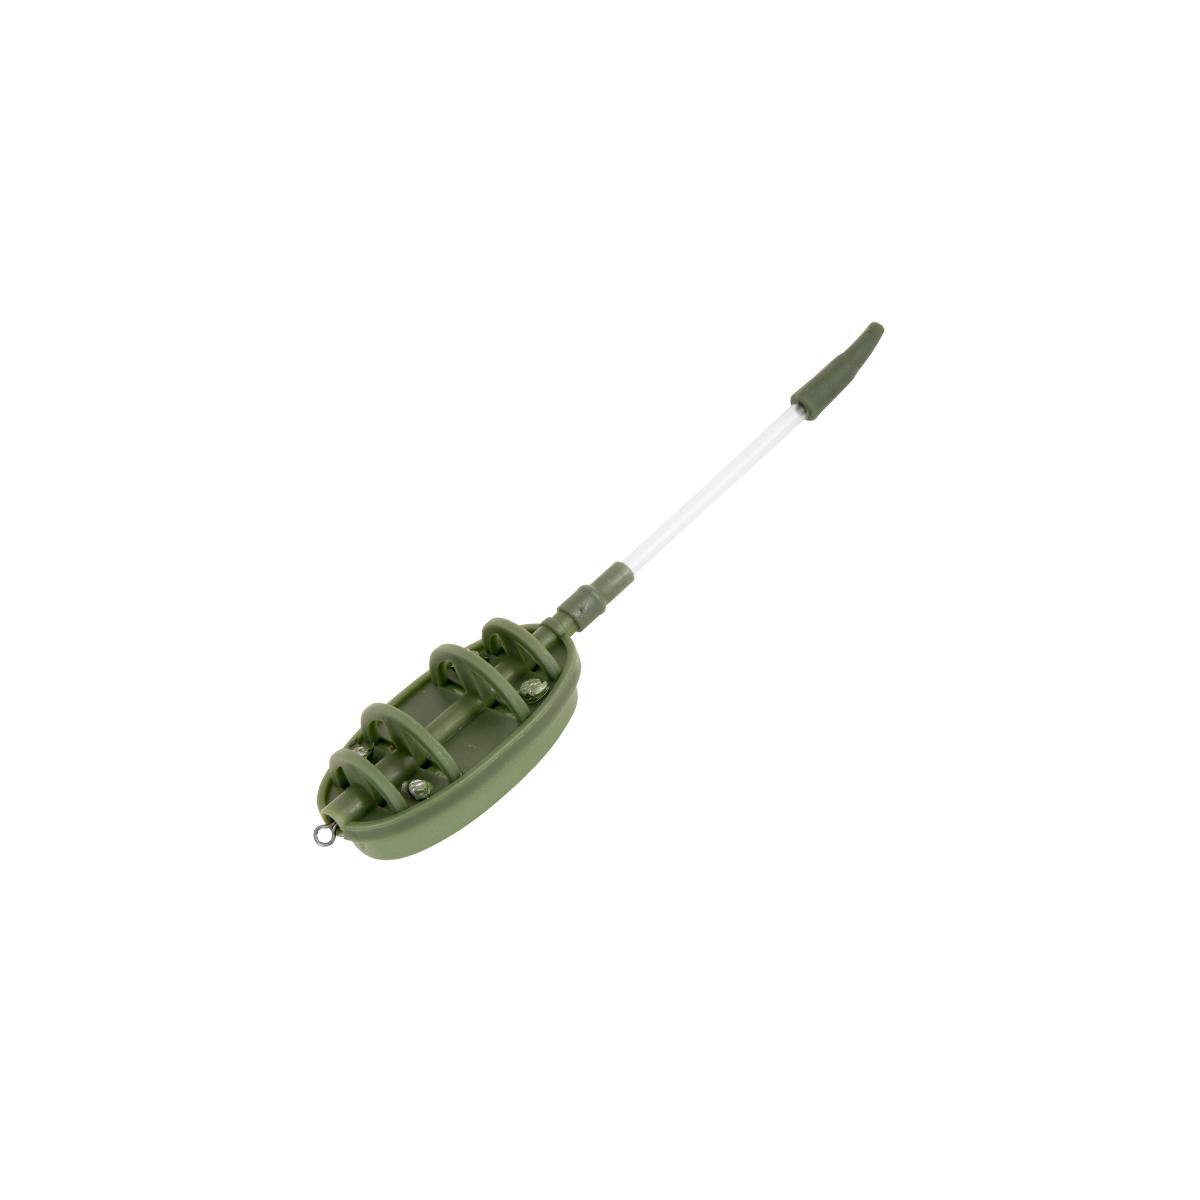 CARP EXPERT DELUXE METHOD COSULET LONGCAST 80 G - 58699280